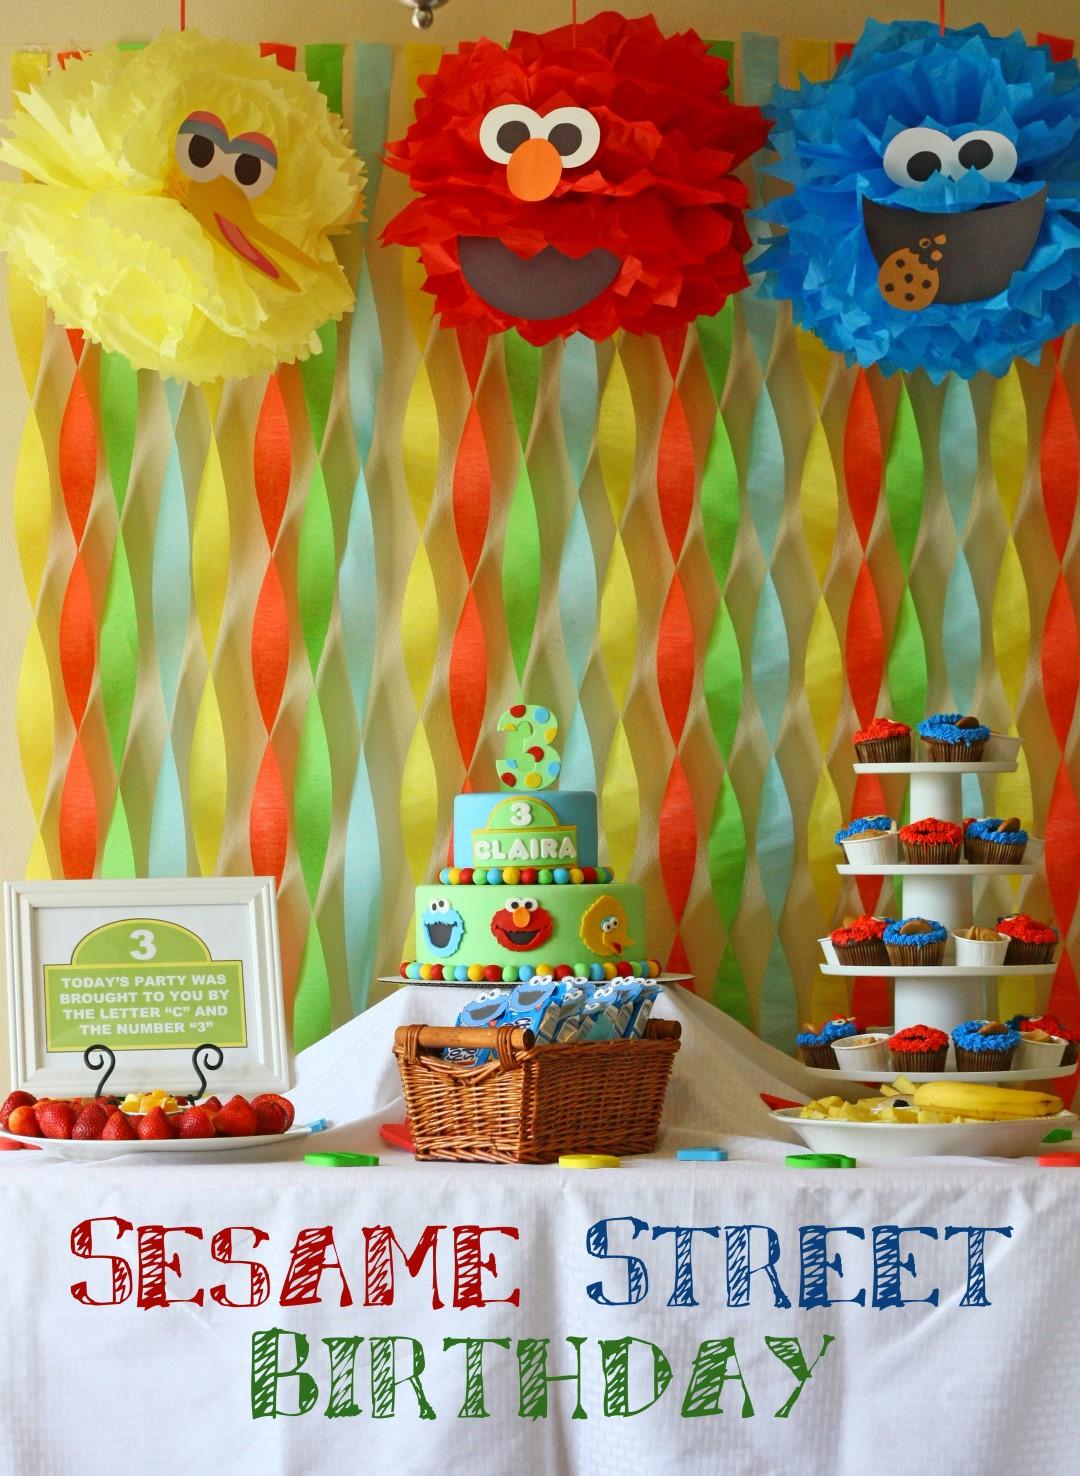 Patty Cakes Bakery Sesame Street Birthday Party Jpg 1080x1476 Baby Elmo Decorations